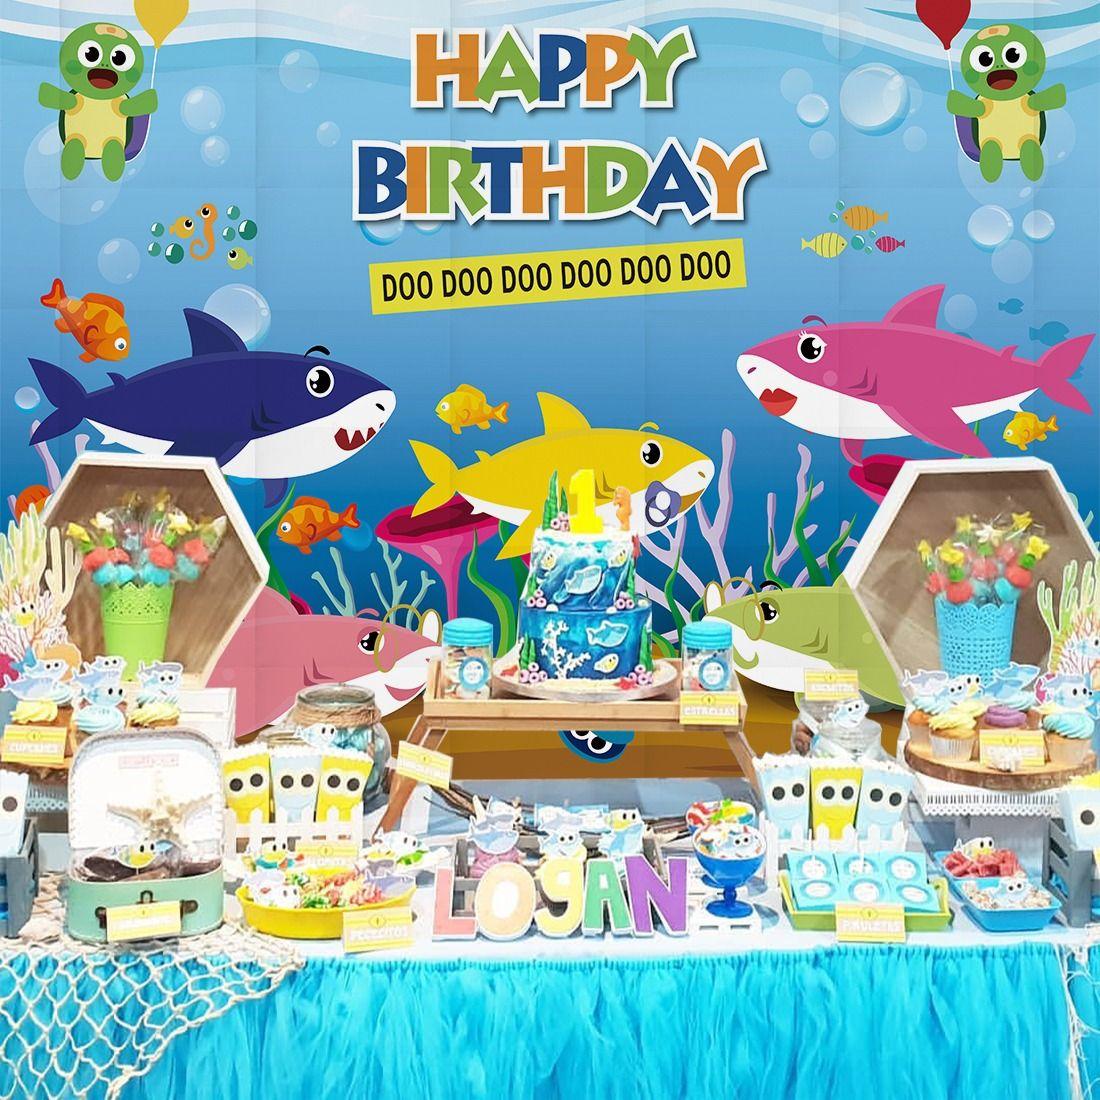 SJOLOON 7X5FT Blue Ocean Shark Birthday Party Backdrop Baby Shark Party Backdrop Baby Shark Banner Photography Backdrops Vinyl Photo Studio Props 11445